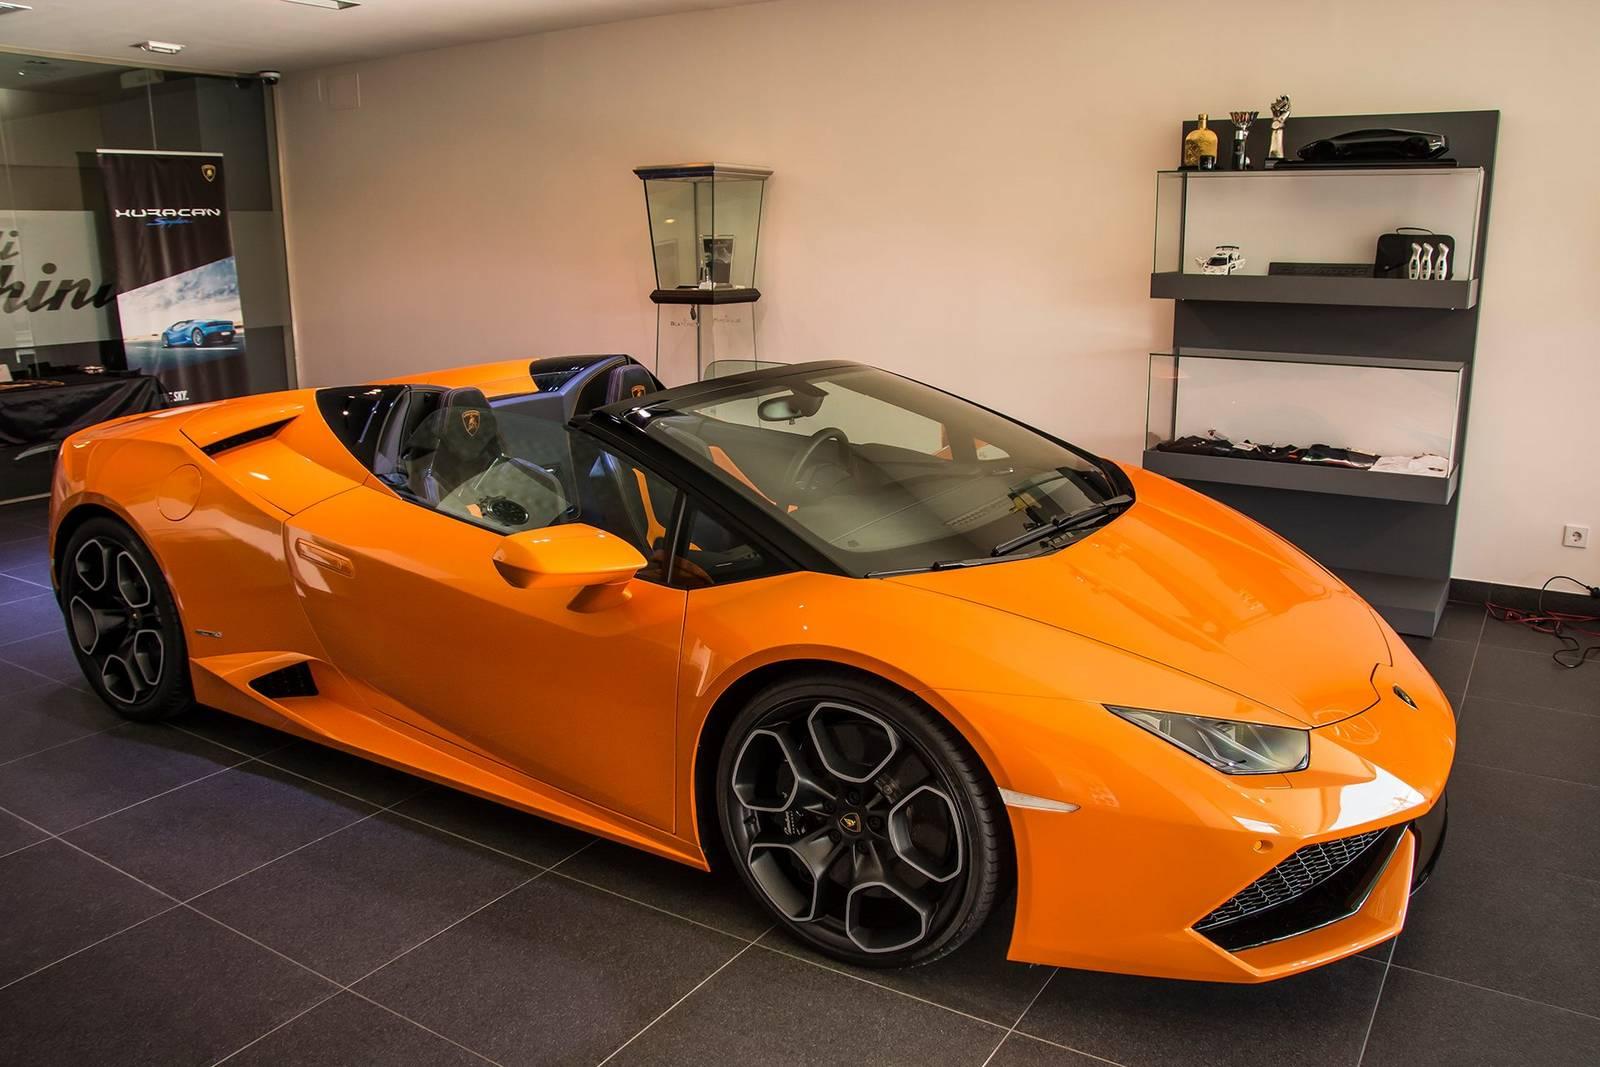 Lamborghini Aventador Spyder >> Orange Lamborghini Huracan Spyder Displayed in Madrid - GTspirit